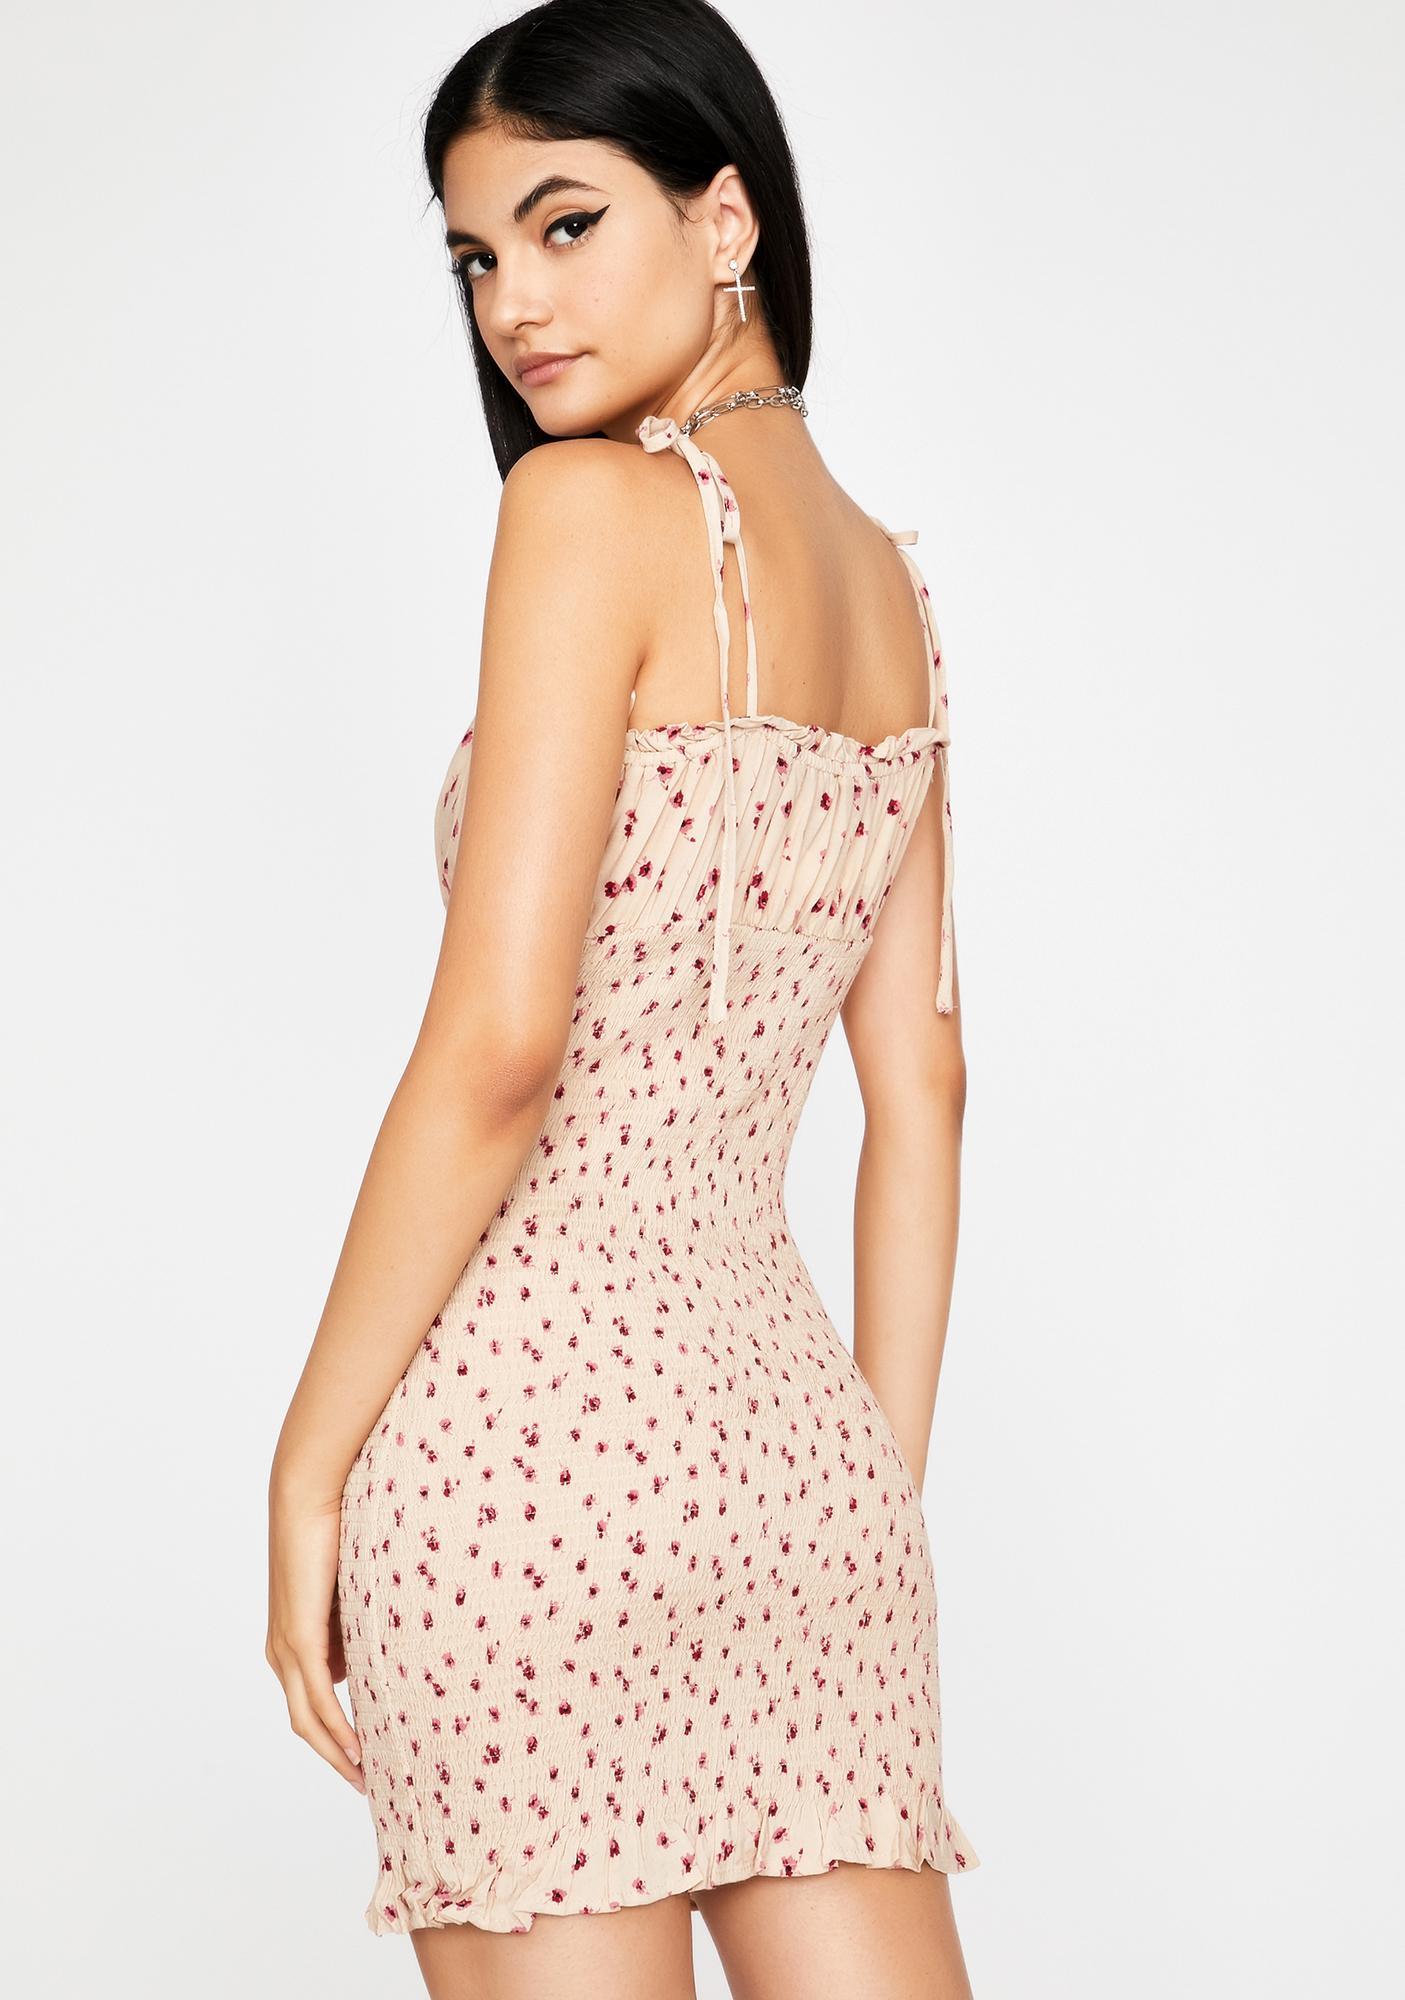 Runaway Date Smocked Dress